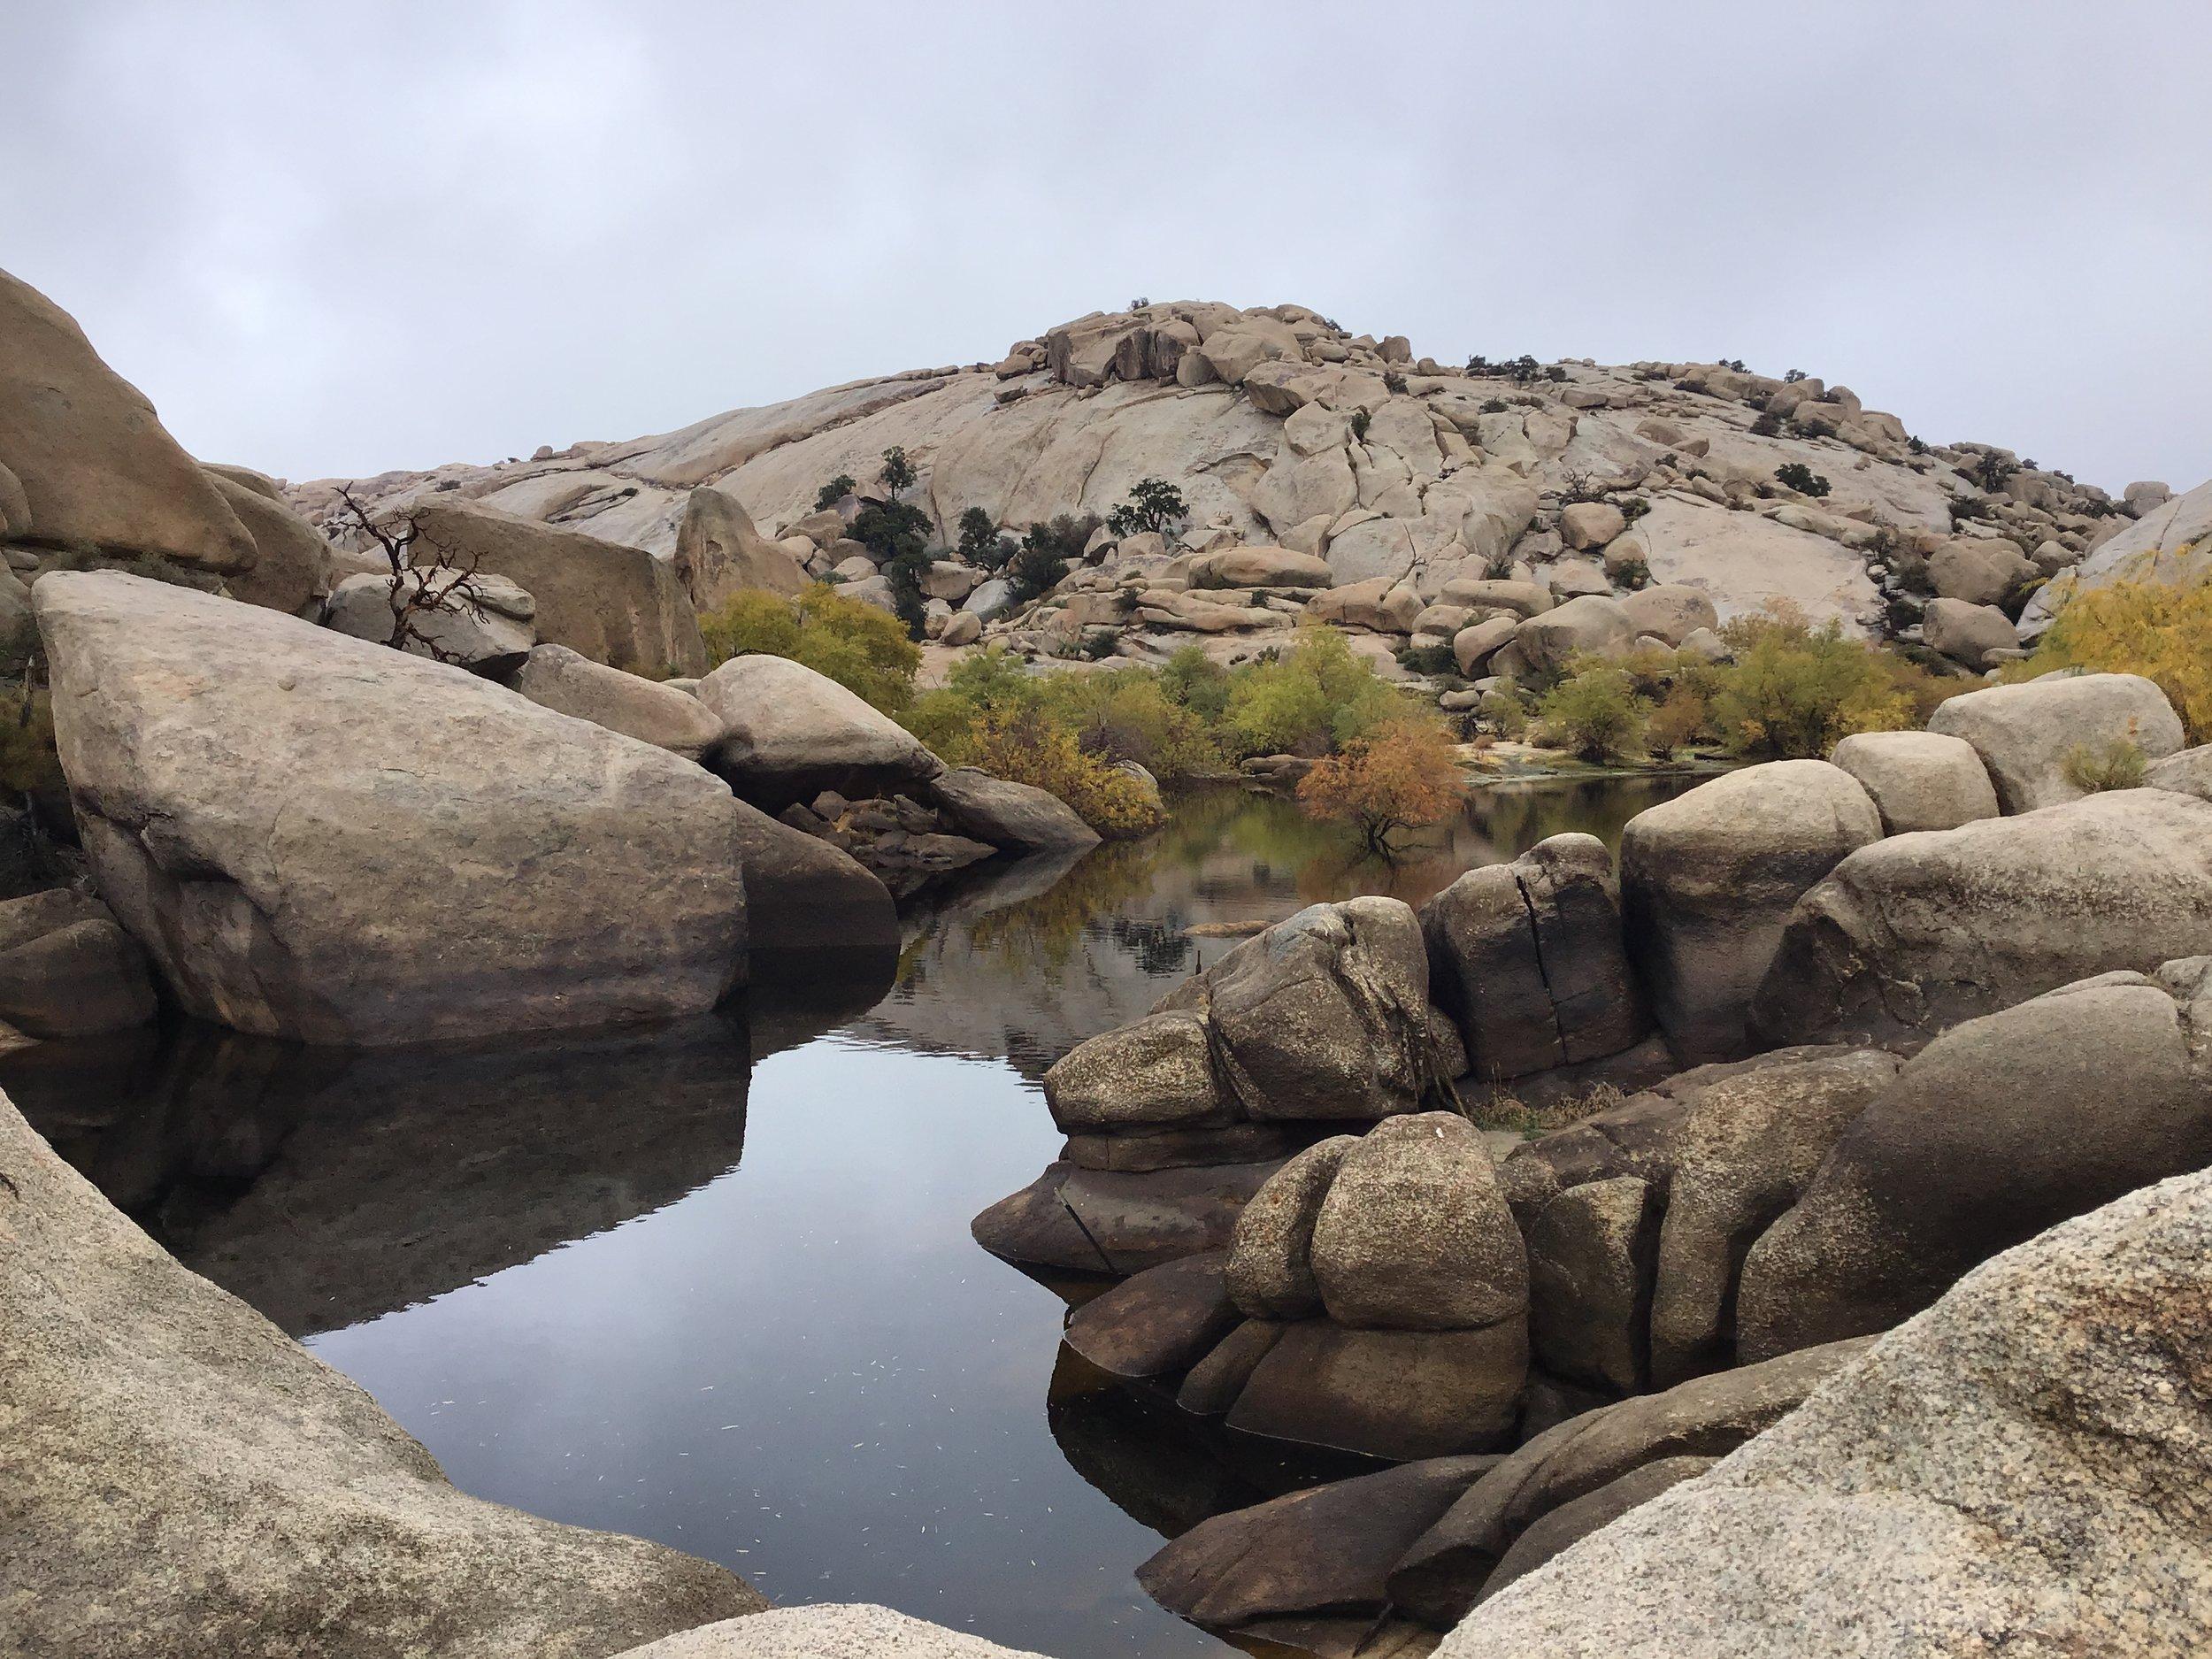 Barker Dam - Joshua Tree National Park